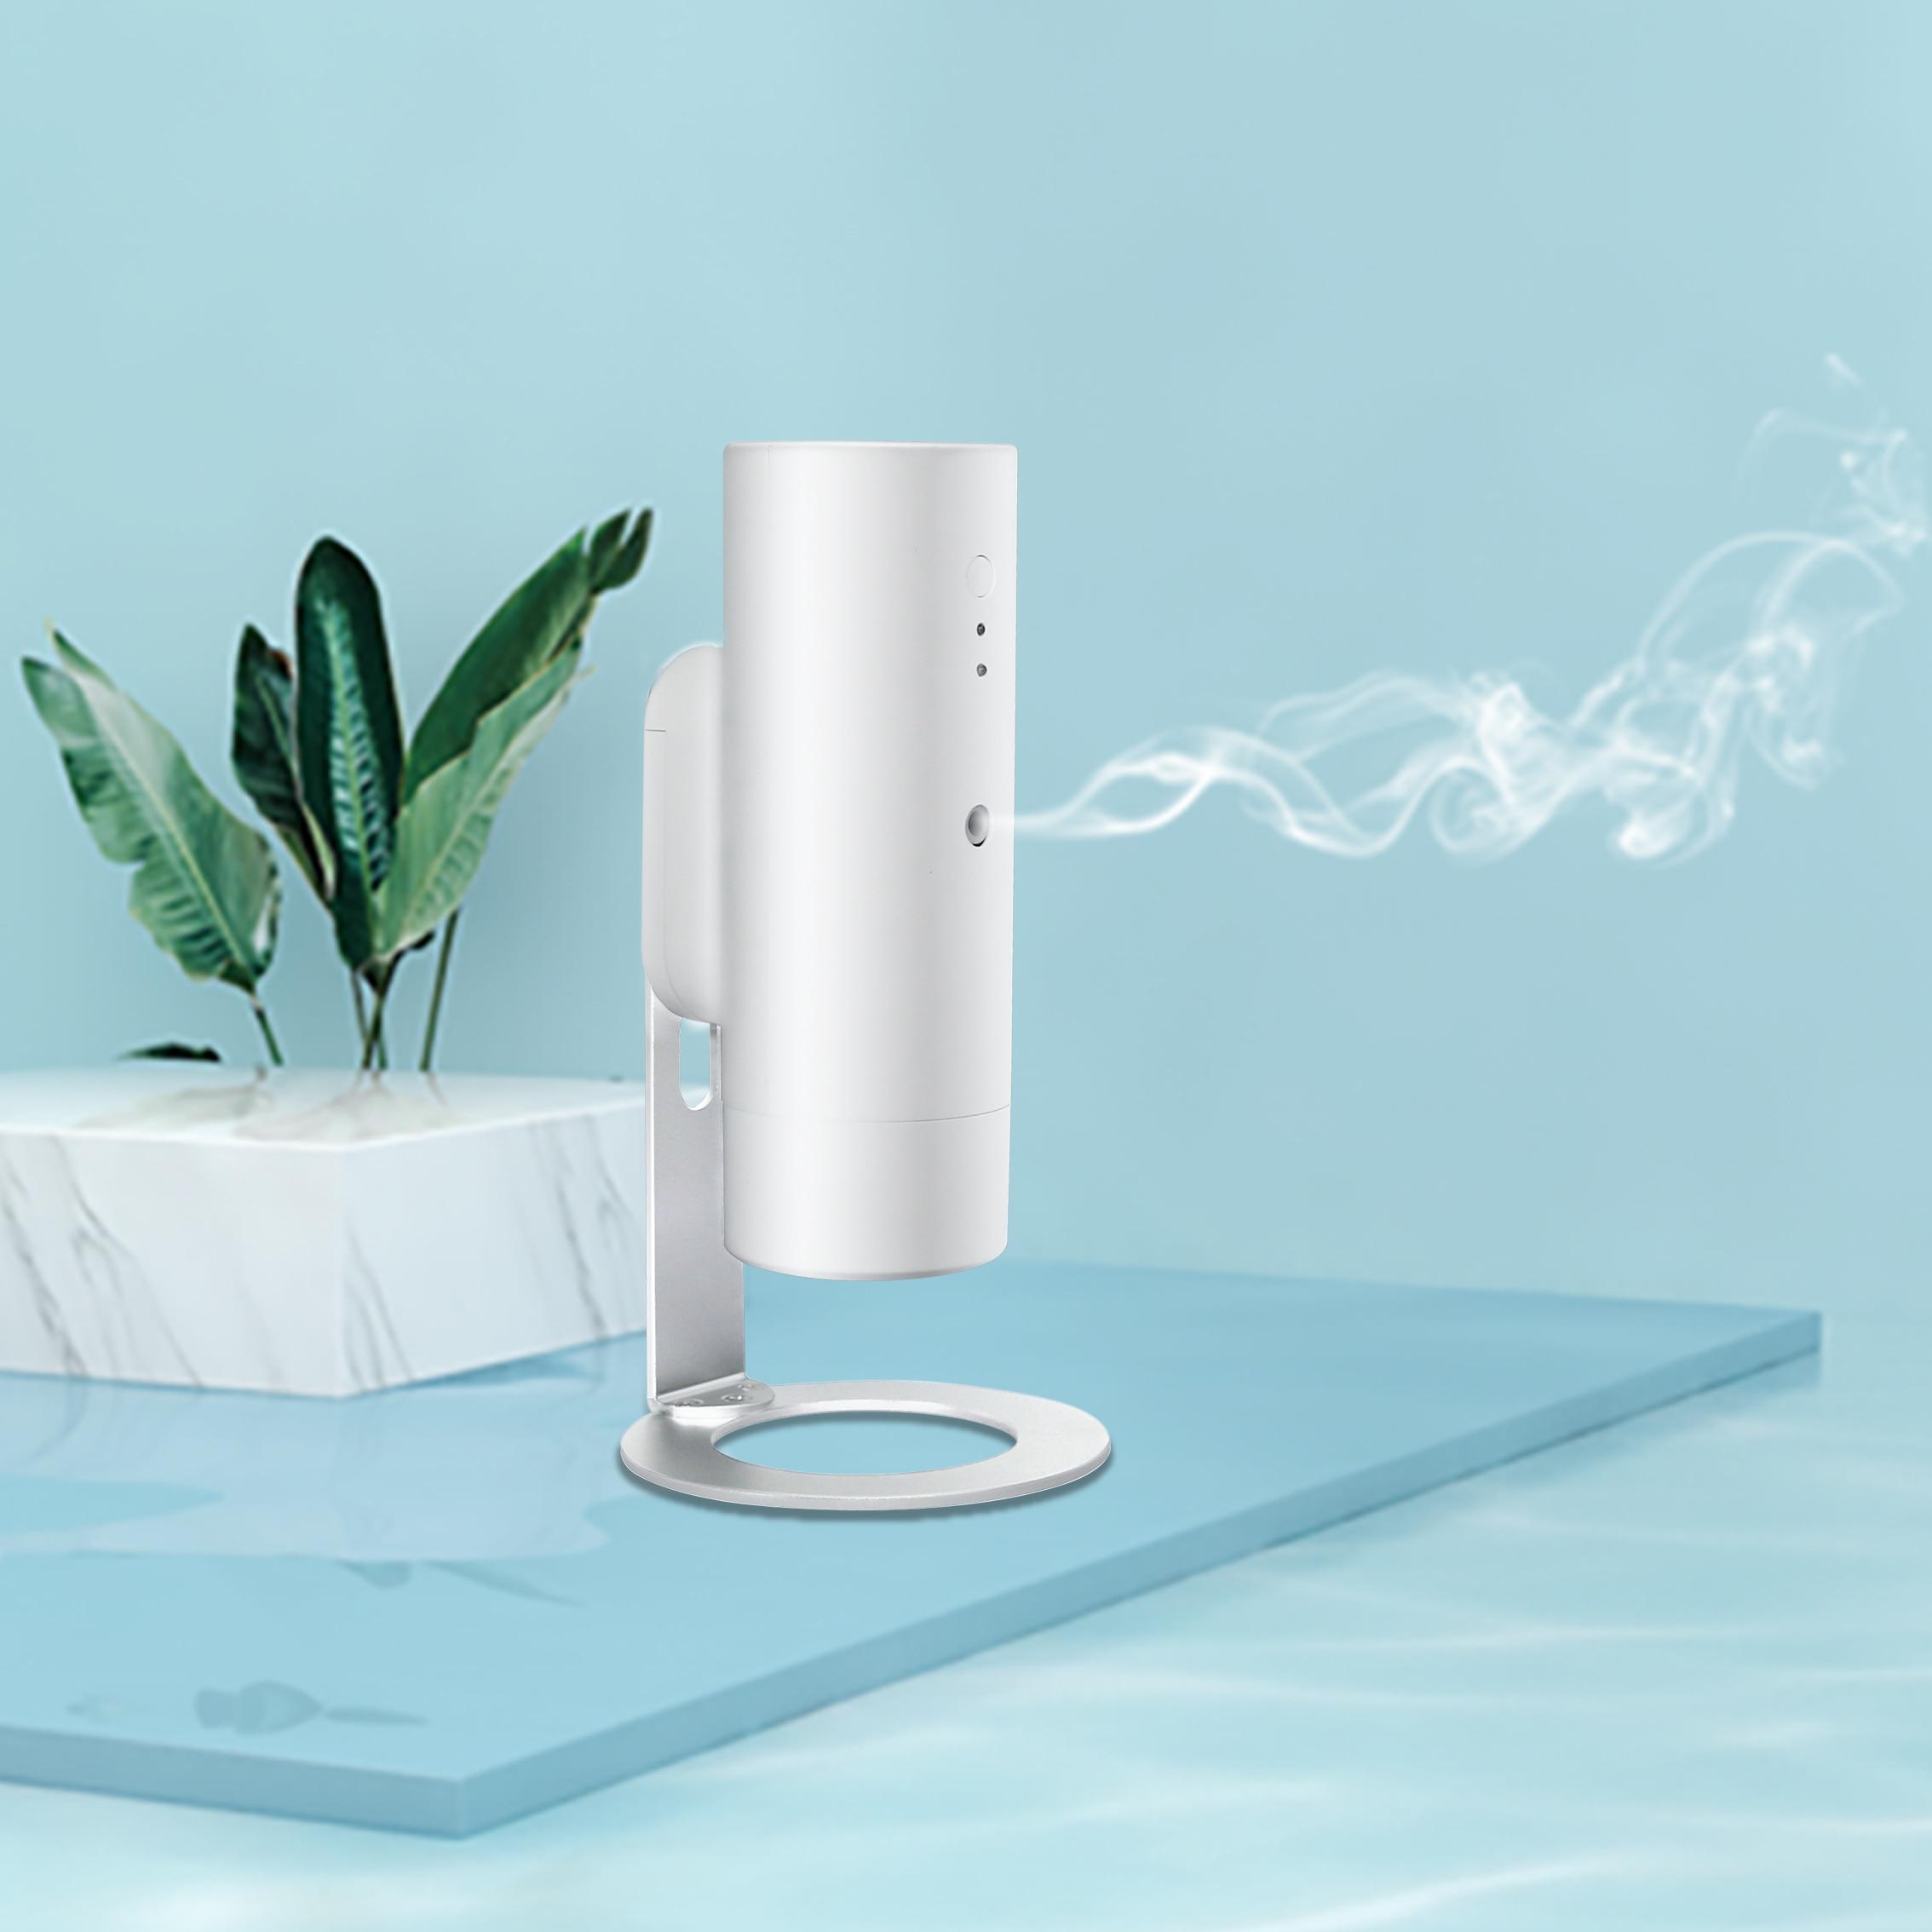 Difusor دي رائحة الأجهزة المنزلية رائحة النفط الناشر آلة